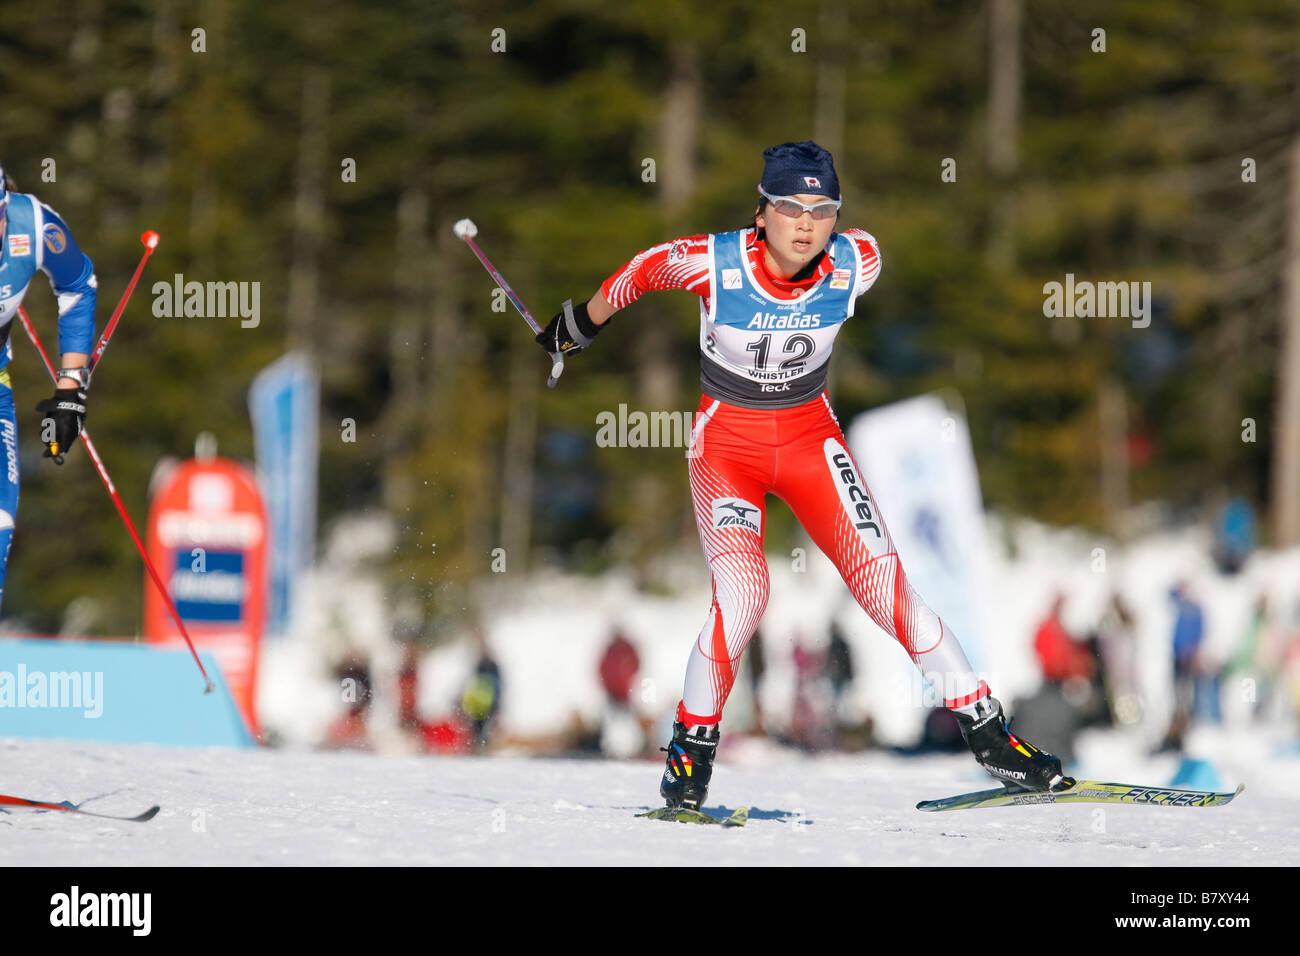 Masako Ishida JPN JANUARY 17 2008 Cross Country Skiing VIESSMANN FIS Cross Country World Cup Ladies 15km Pursuit - Stock Image